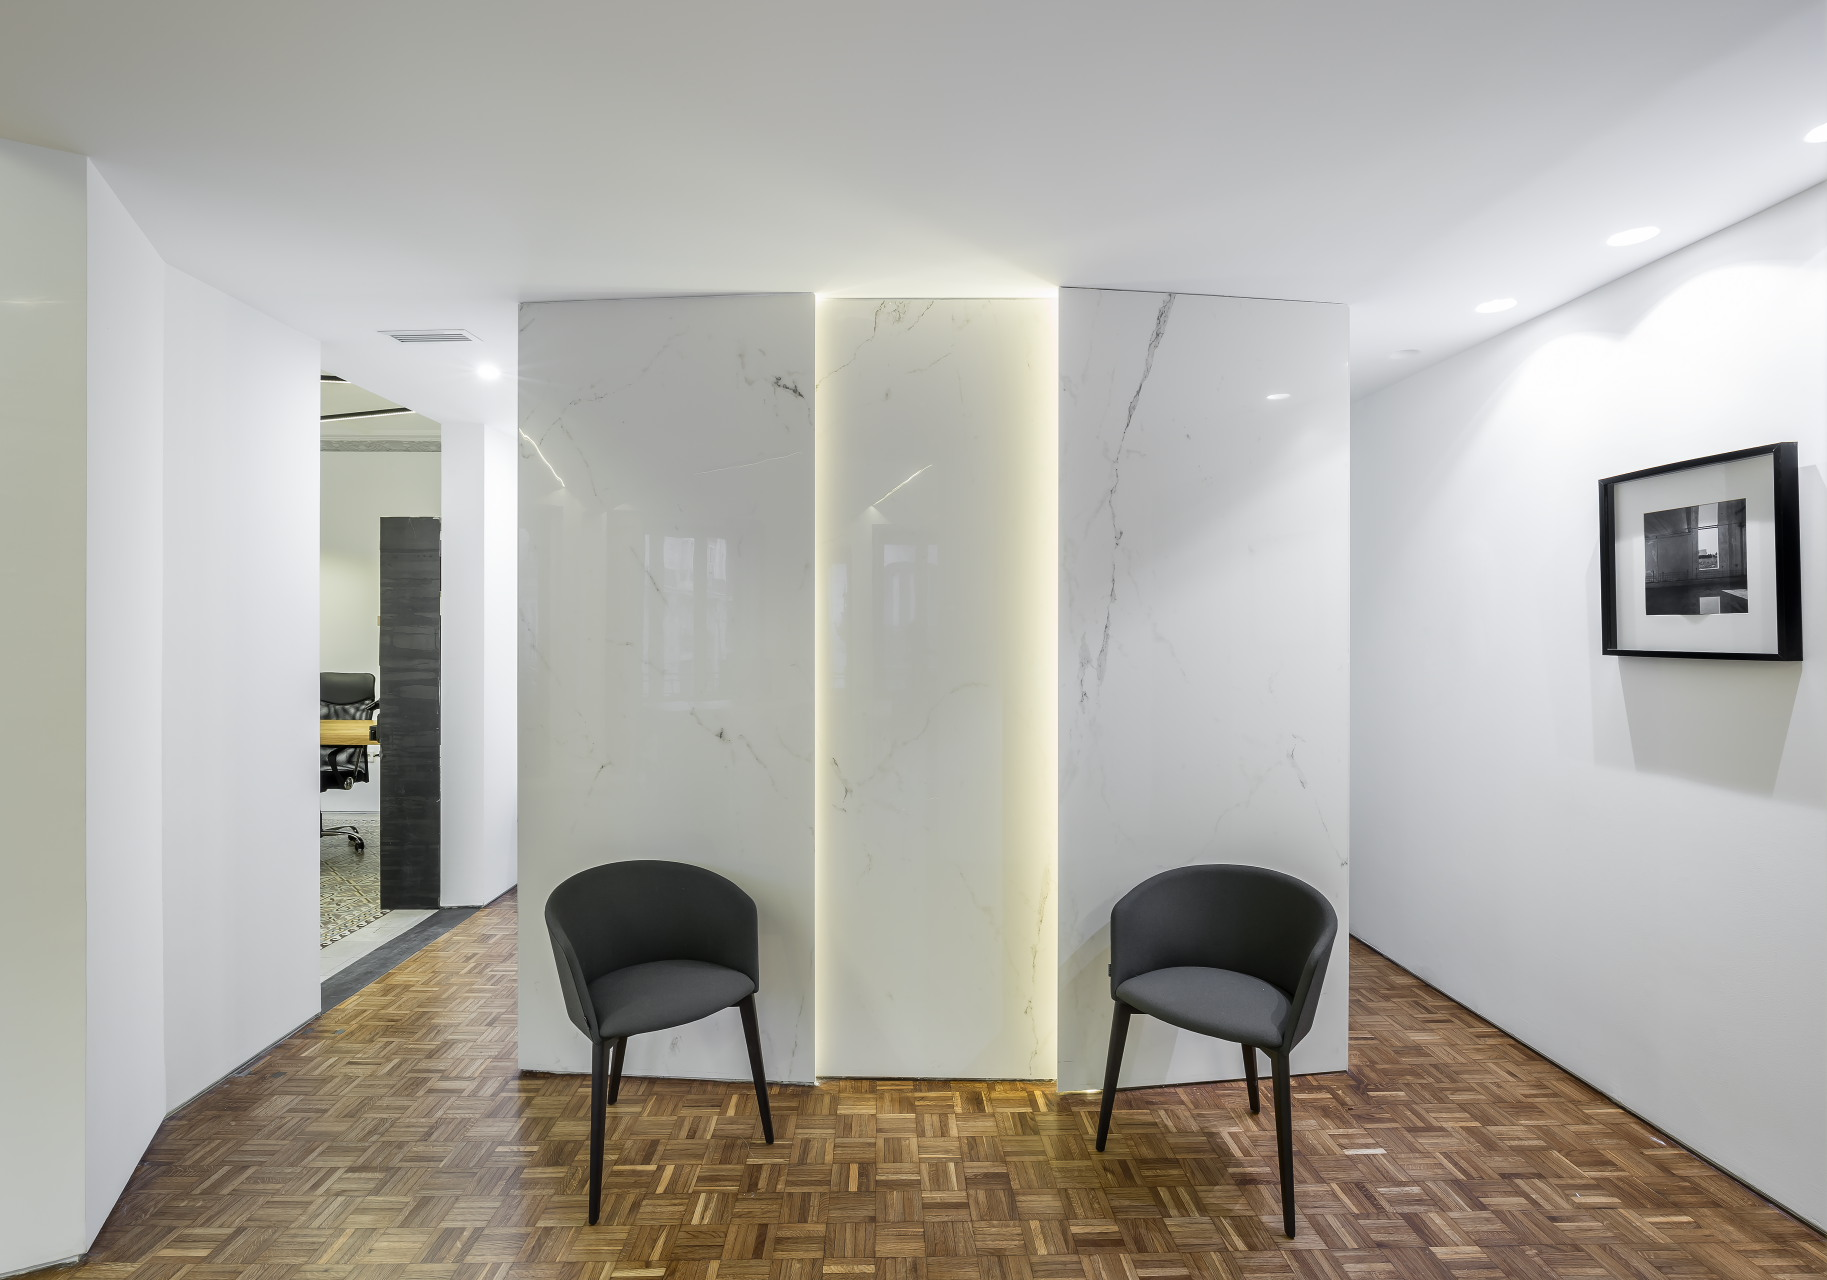 fotografia-arquitectura-interiorismo-valencia-german-cabo-viraje-estudio-pujol (11)